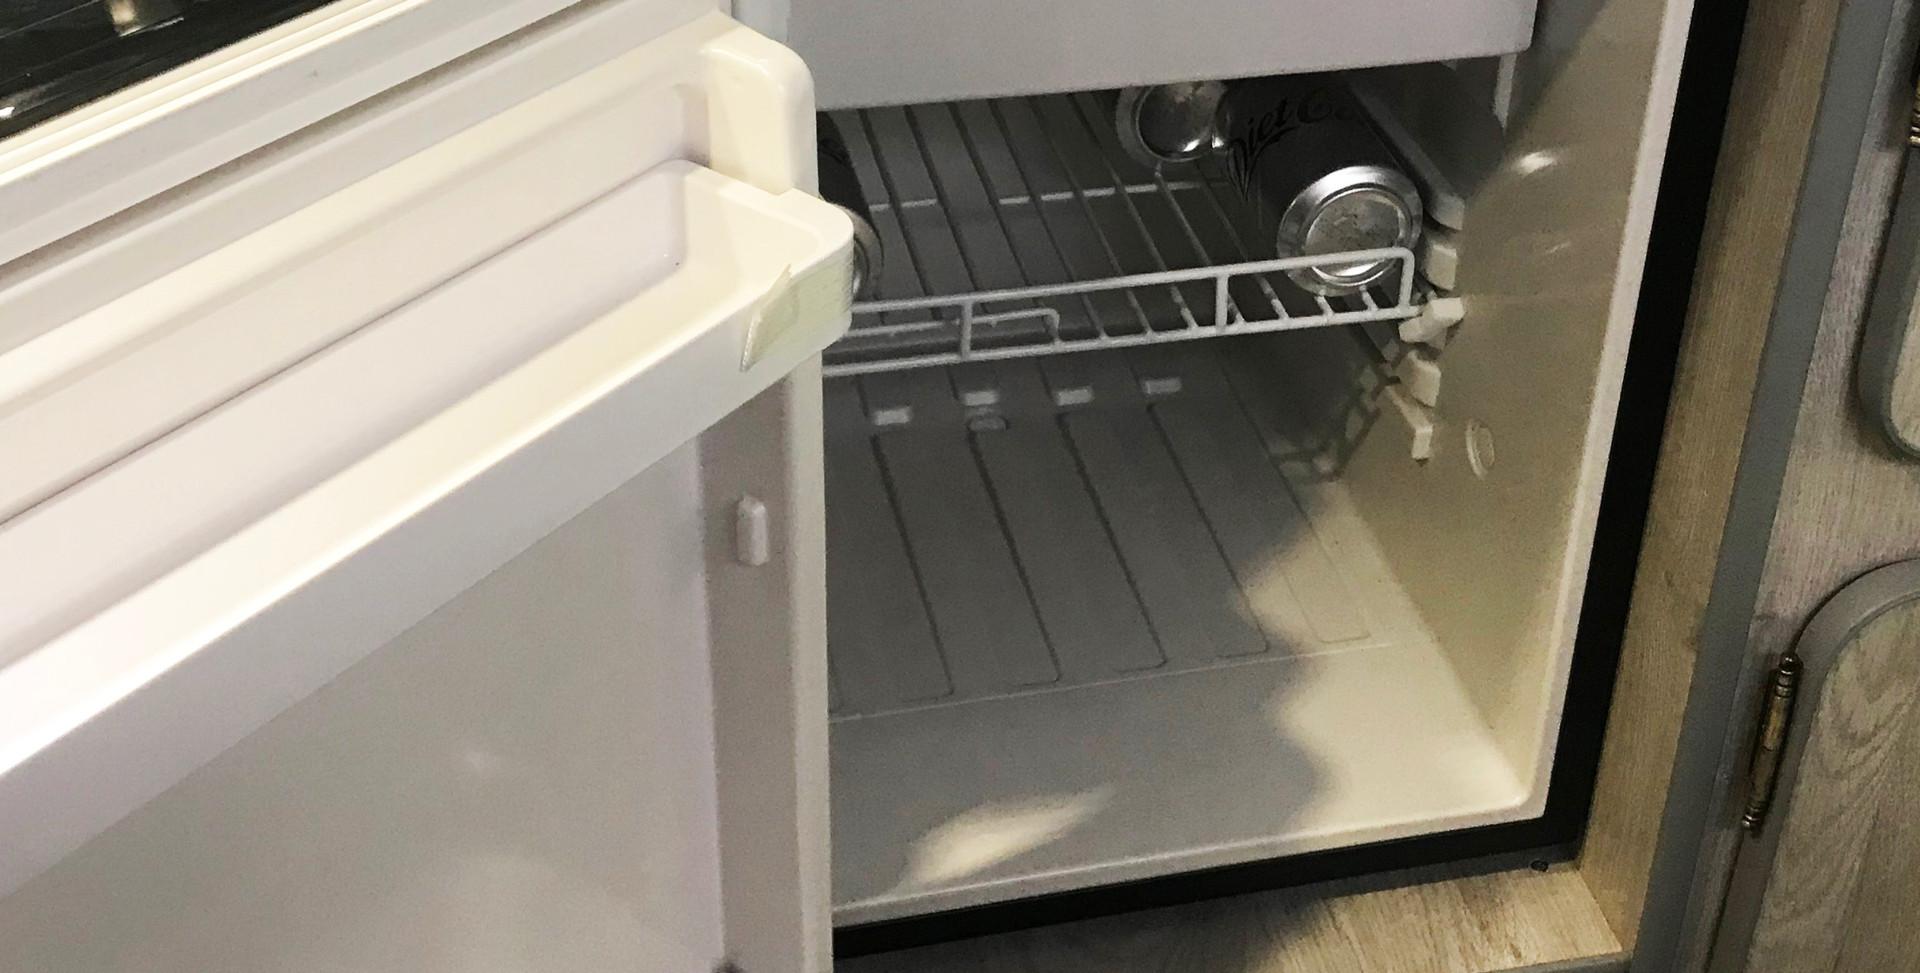 Go-Pod front opener compressor fridge - CRE50